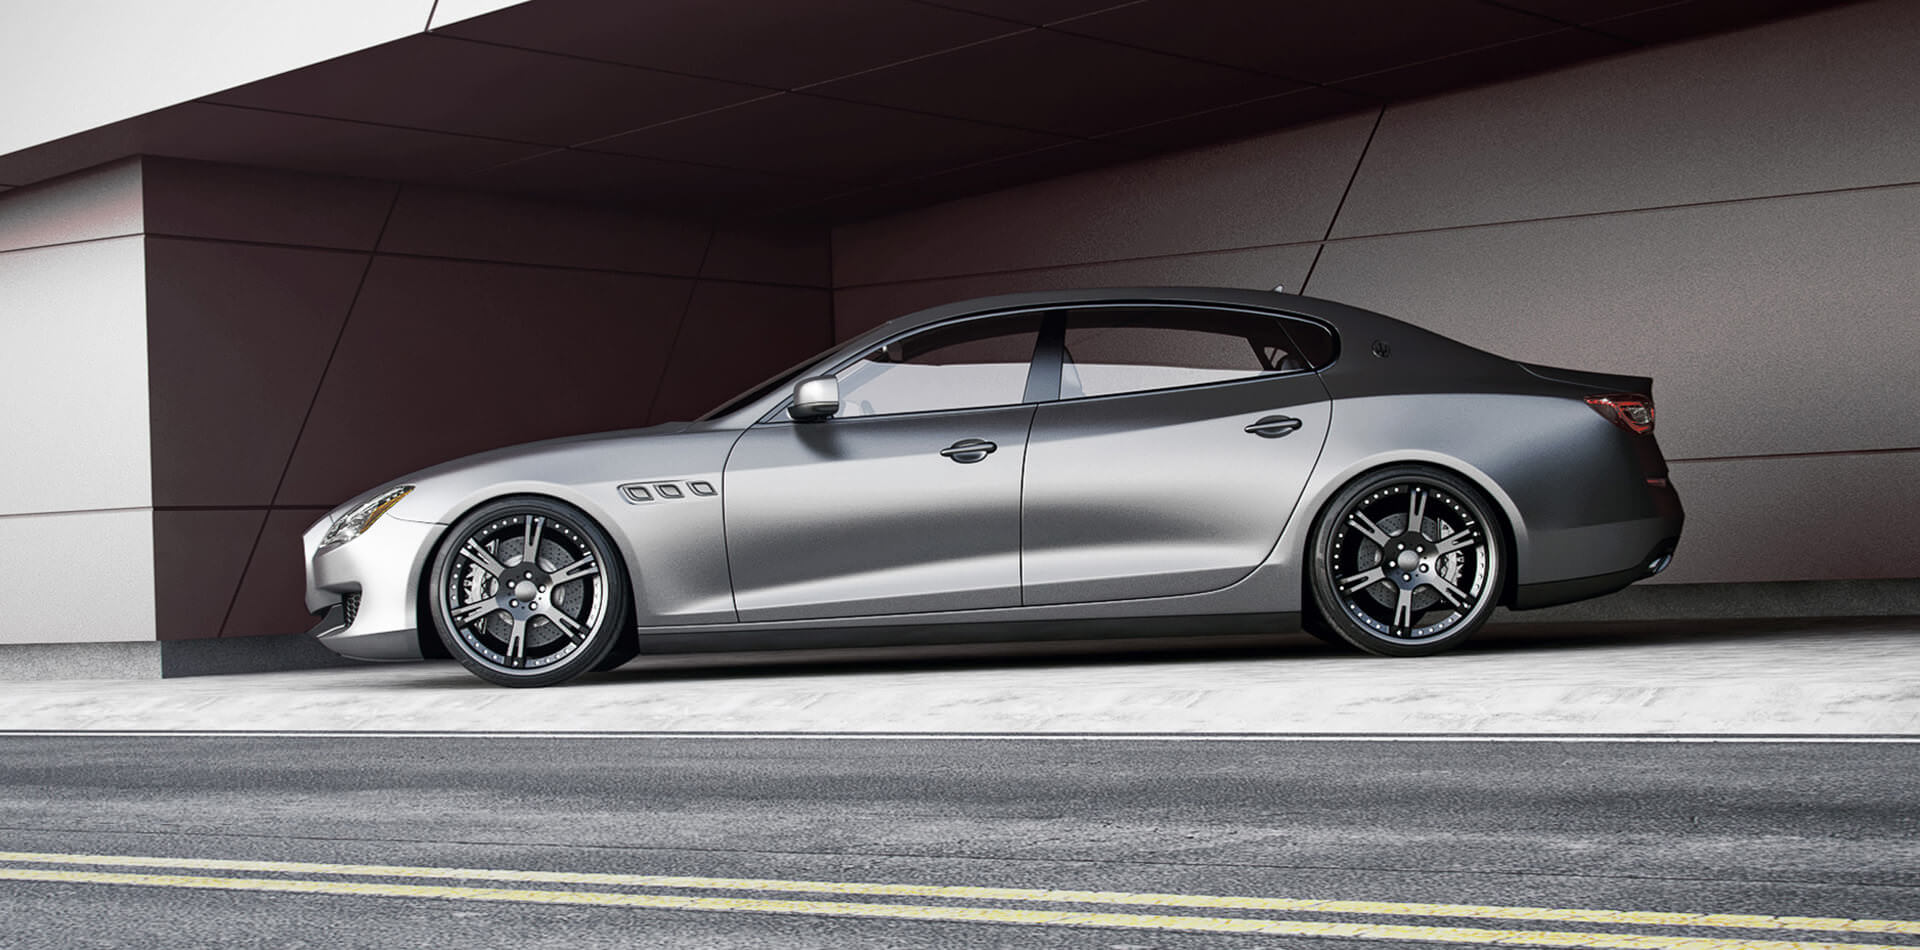 Maserati_Quattroporte_Tuning-2